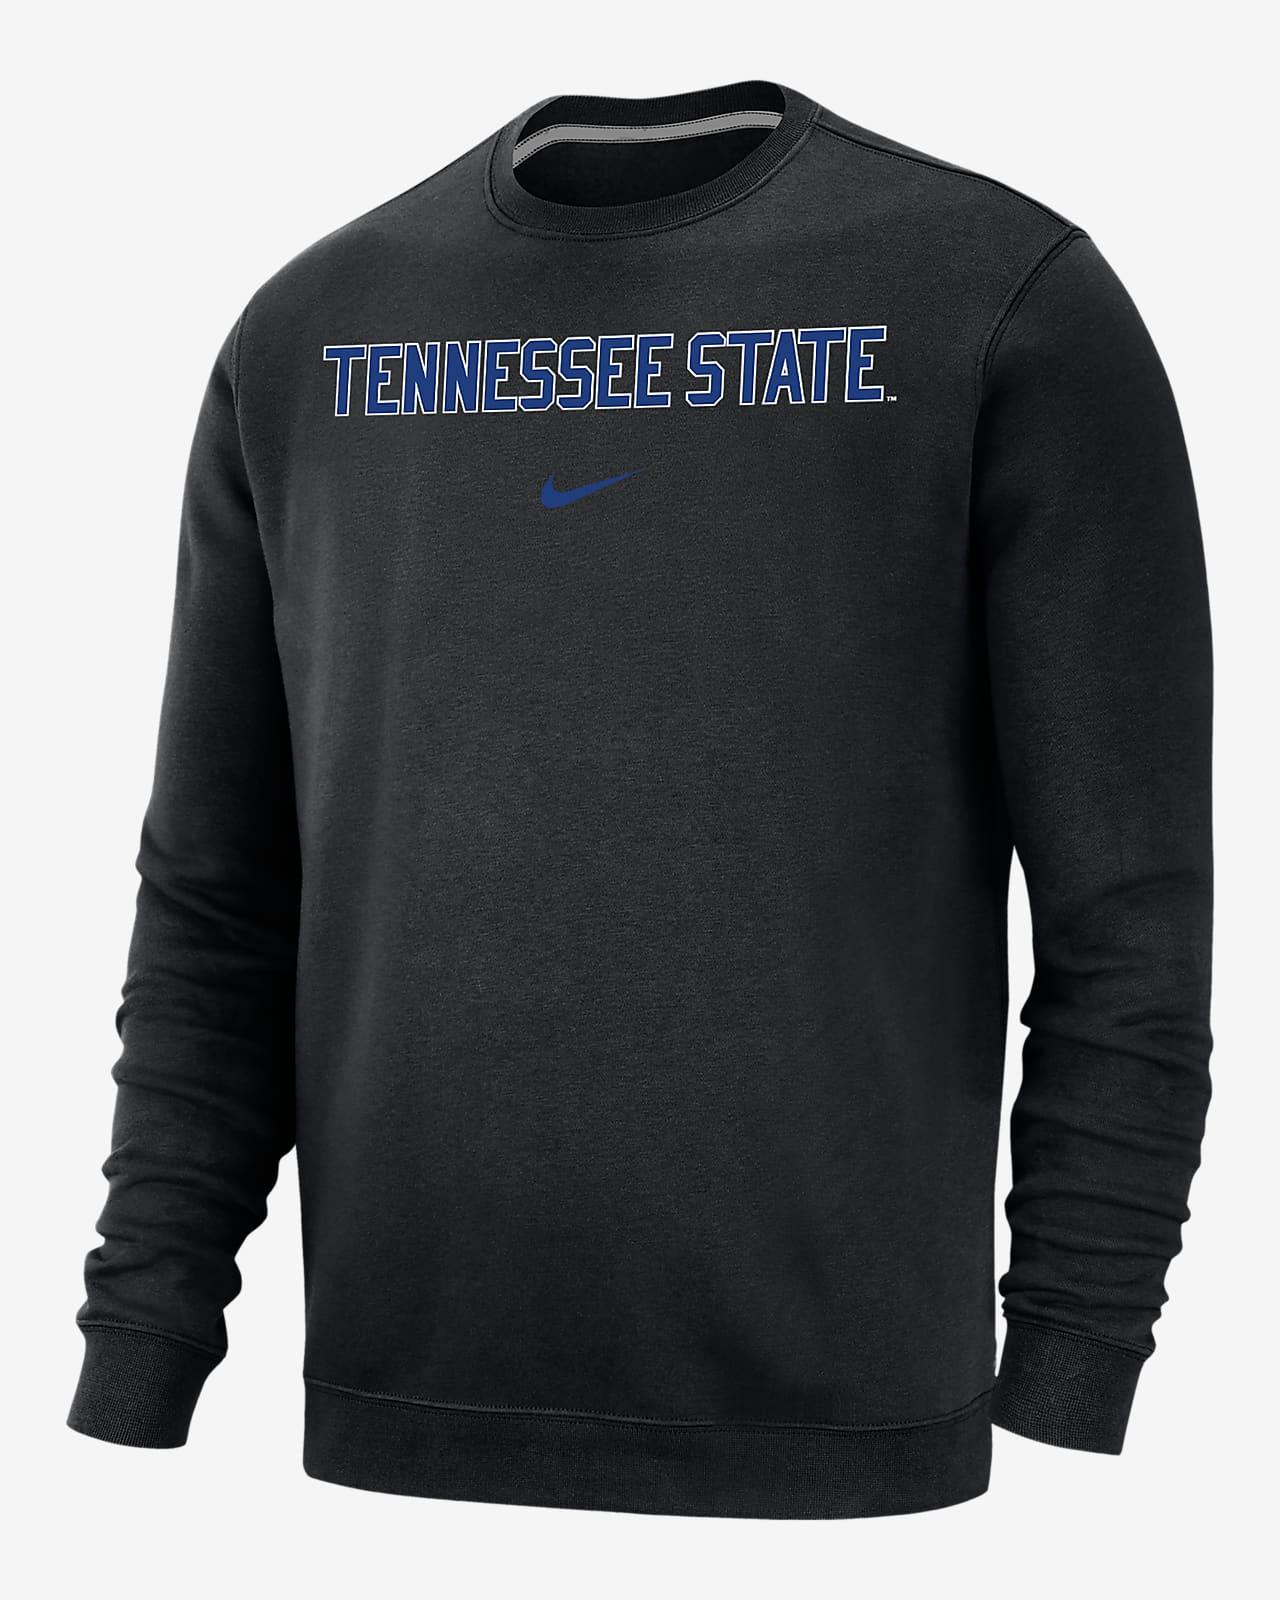 Nike College Club Fleece (Tennessee State) Crew Sweatshirt